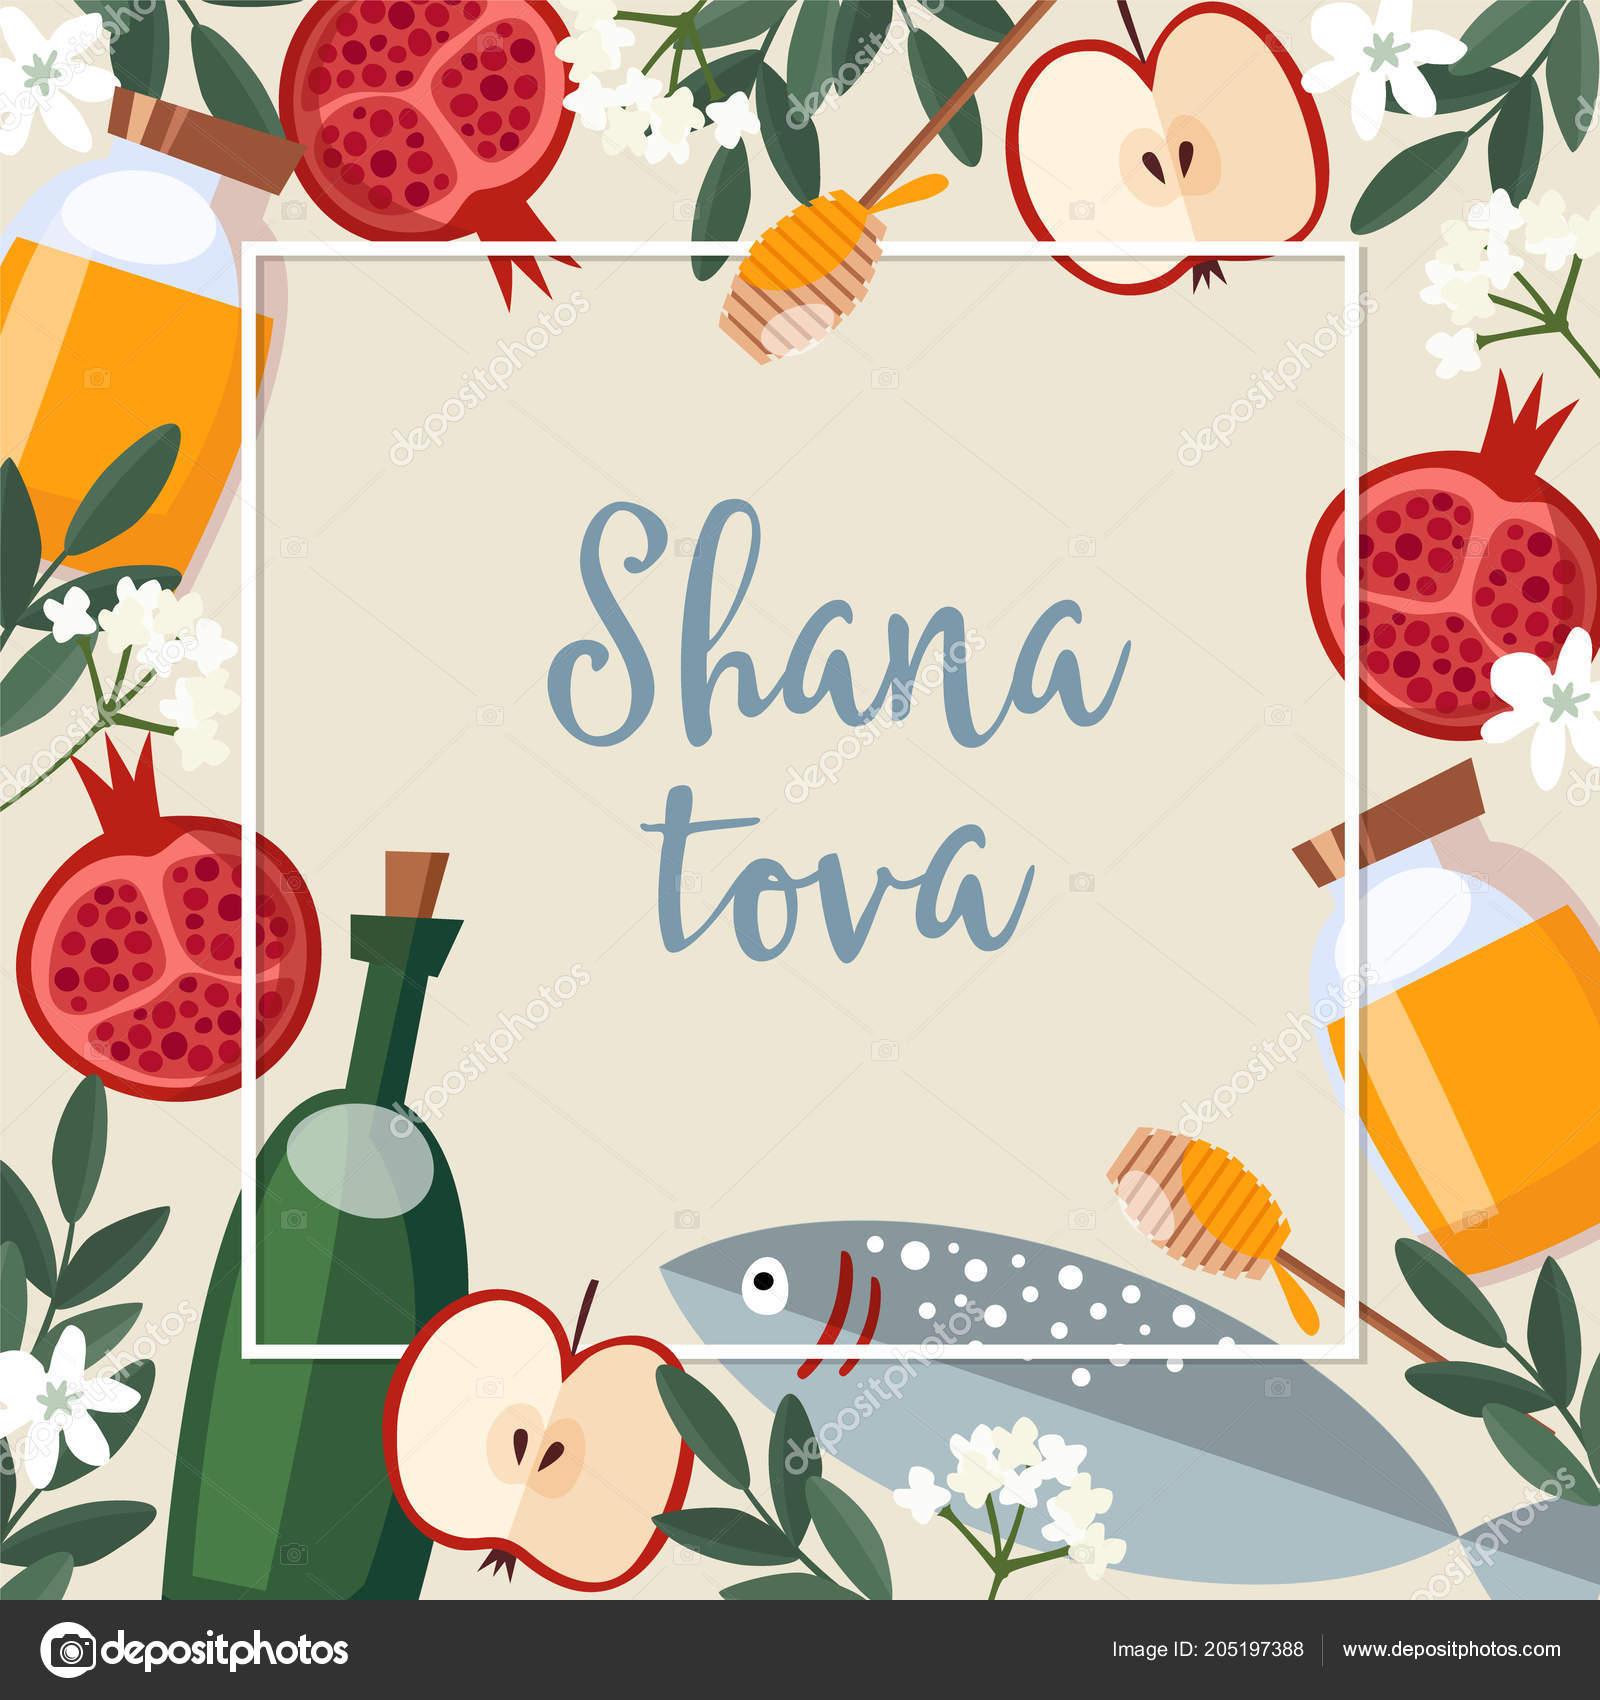 Shana Tova Greeting Card Jewish New Year Rosh Hashana Invitation